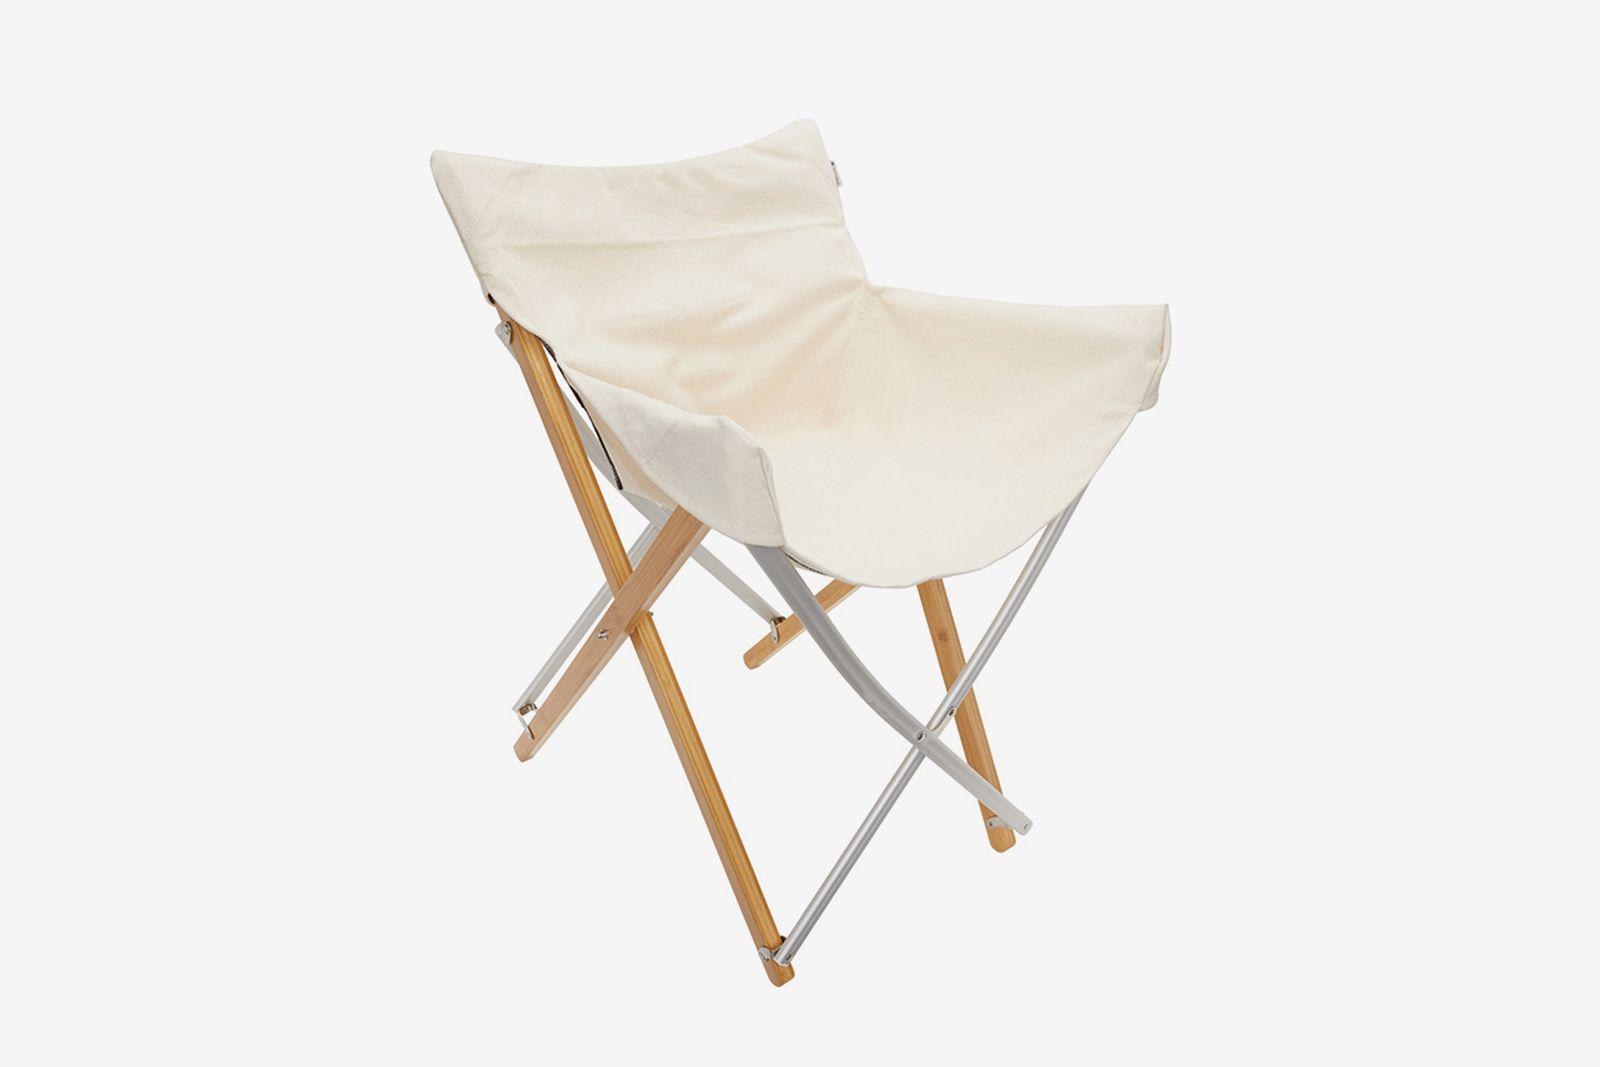 snow-peak-beige-bamboo-long-take-chair